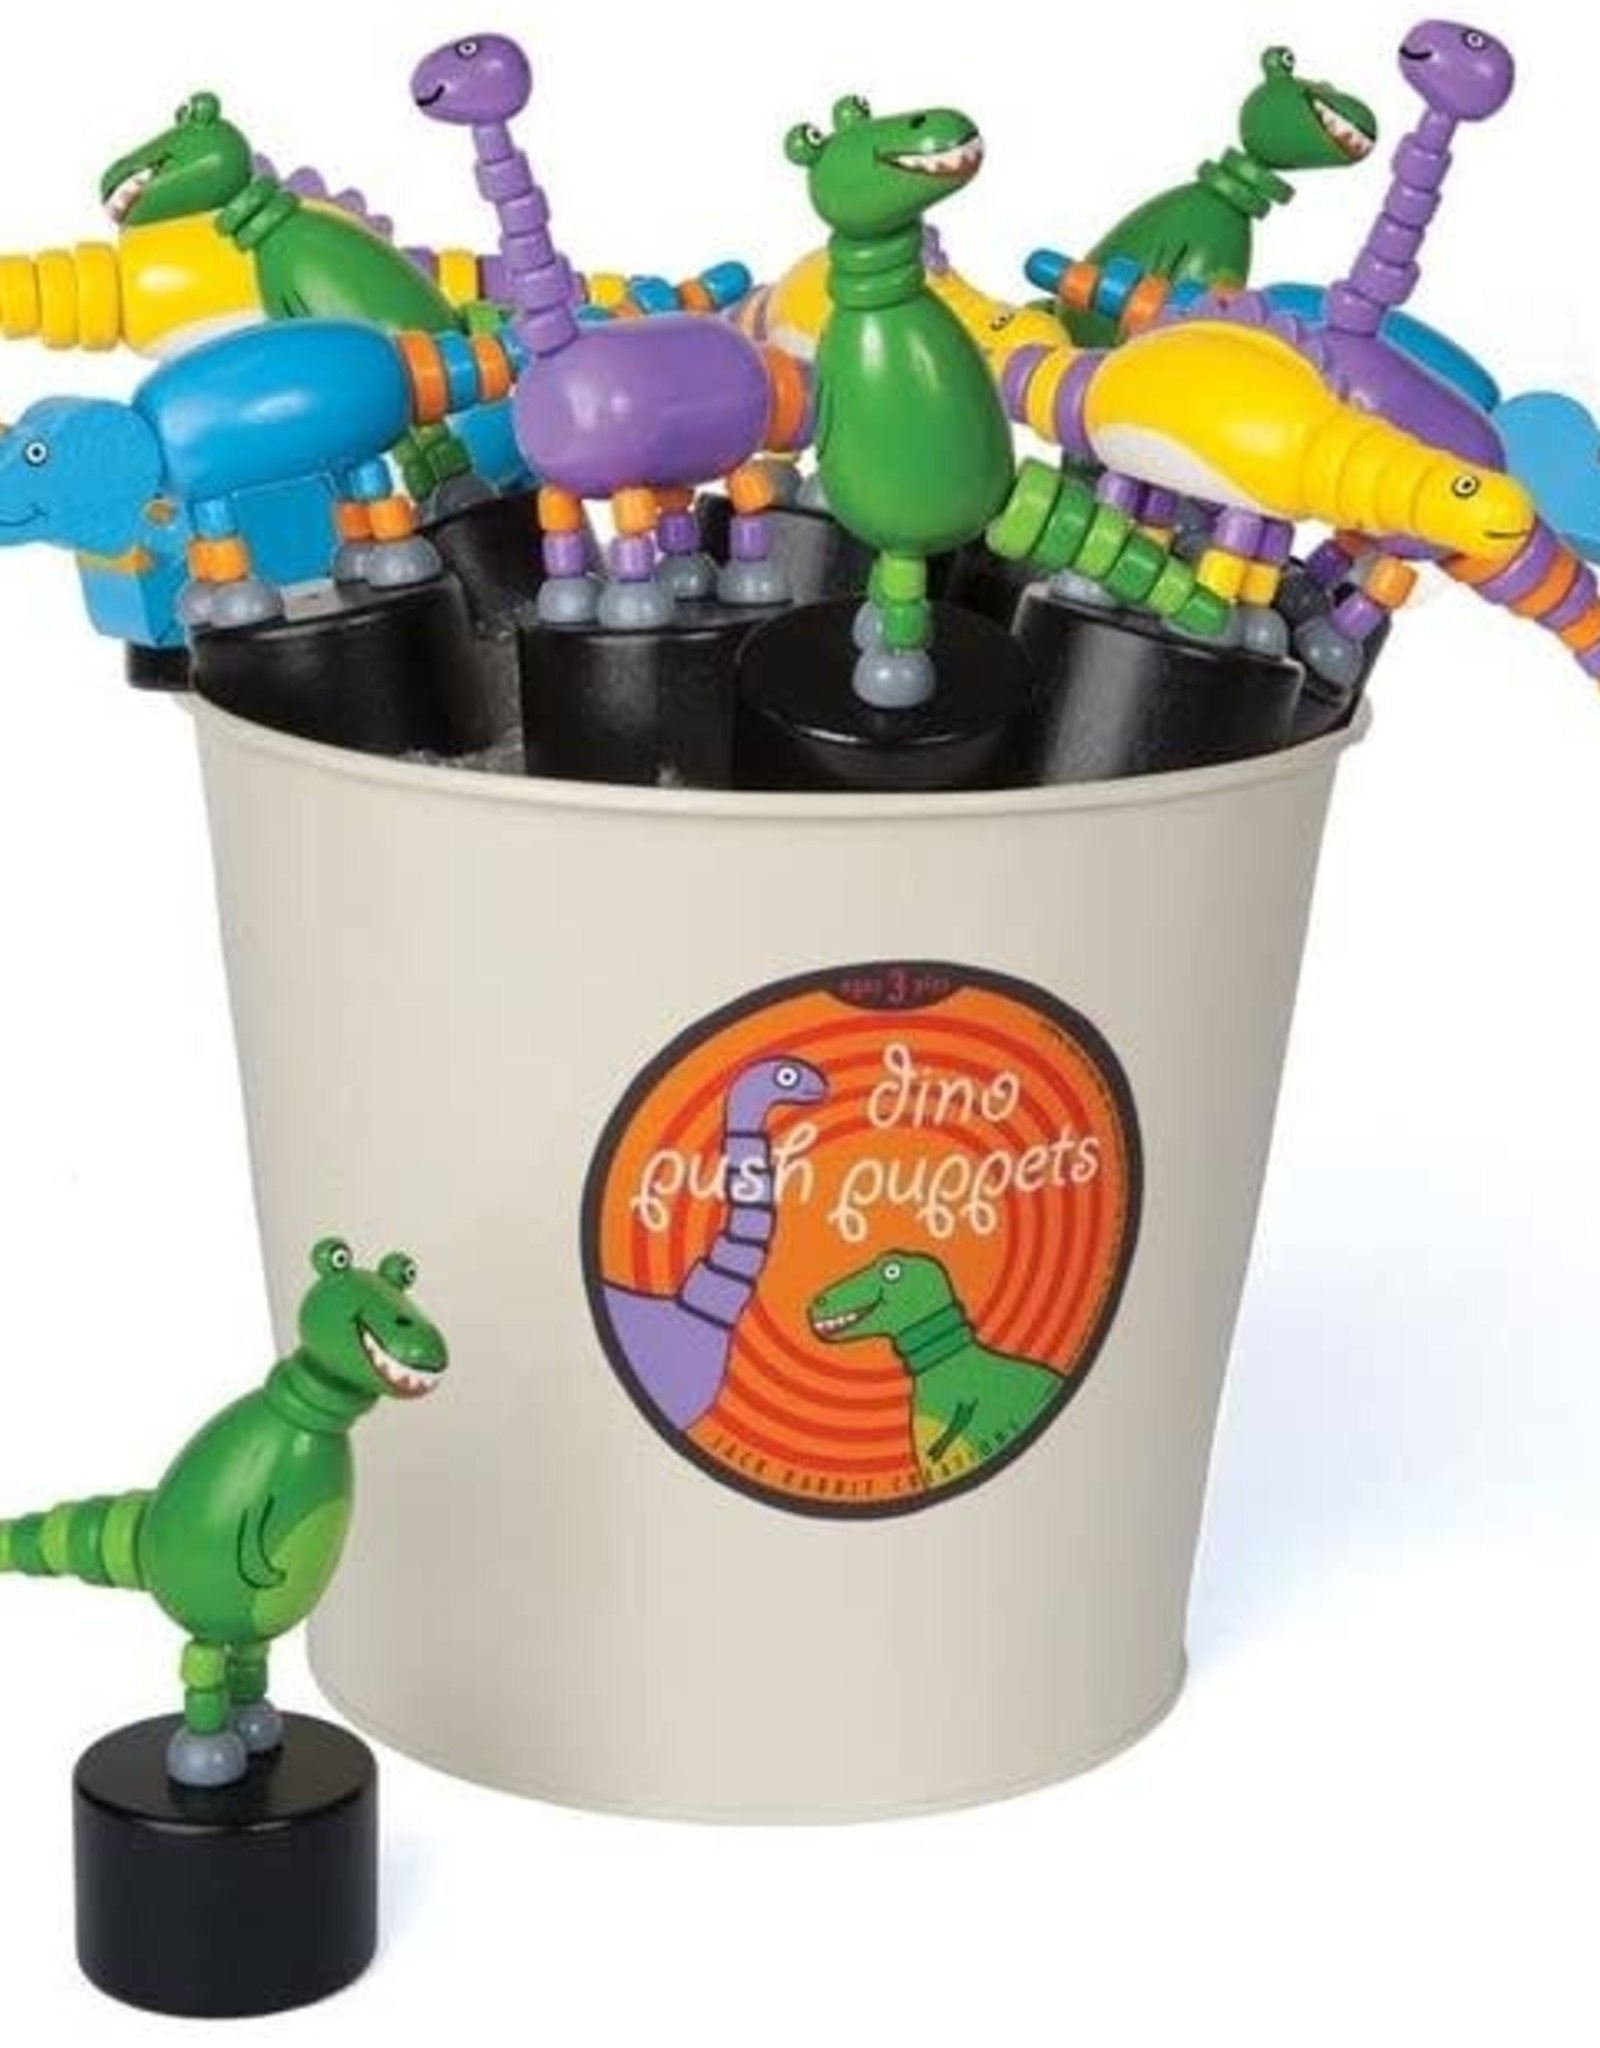 Jack Rabbit Push Puppet Dinosaur